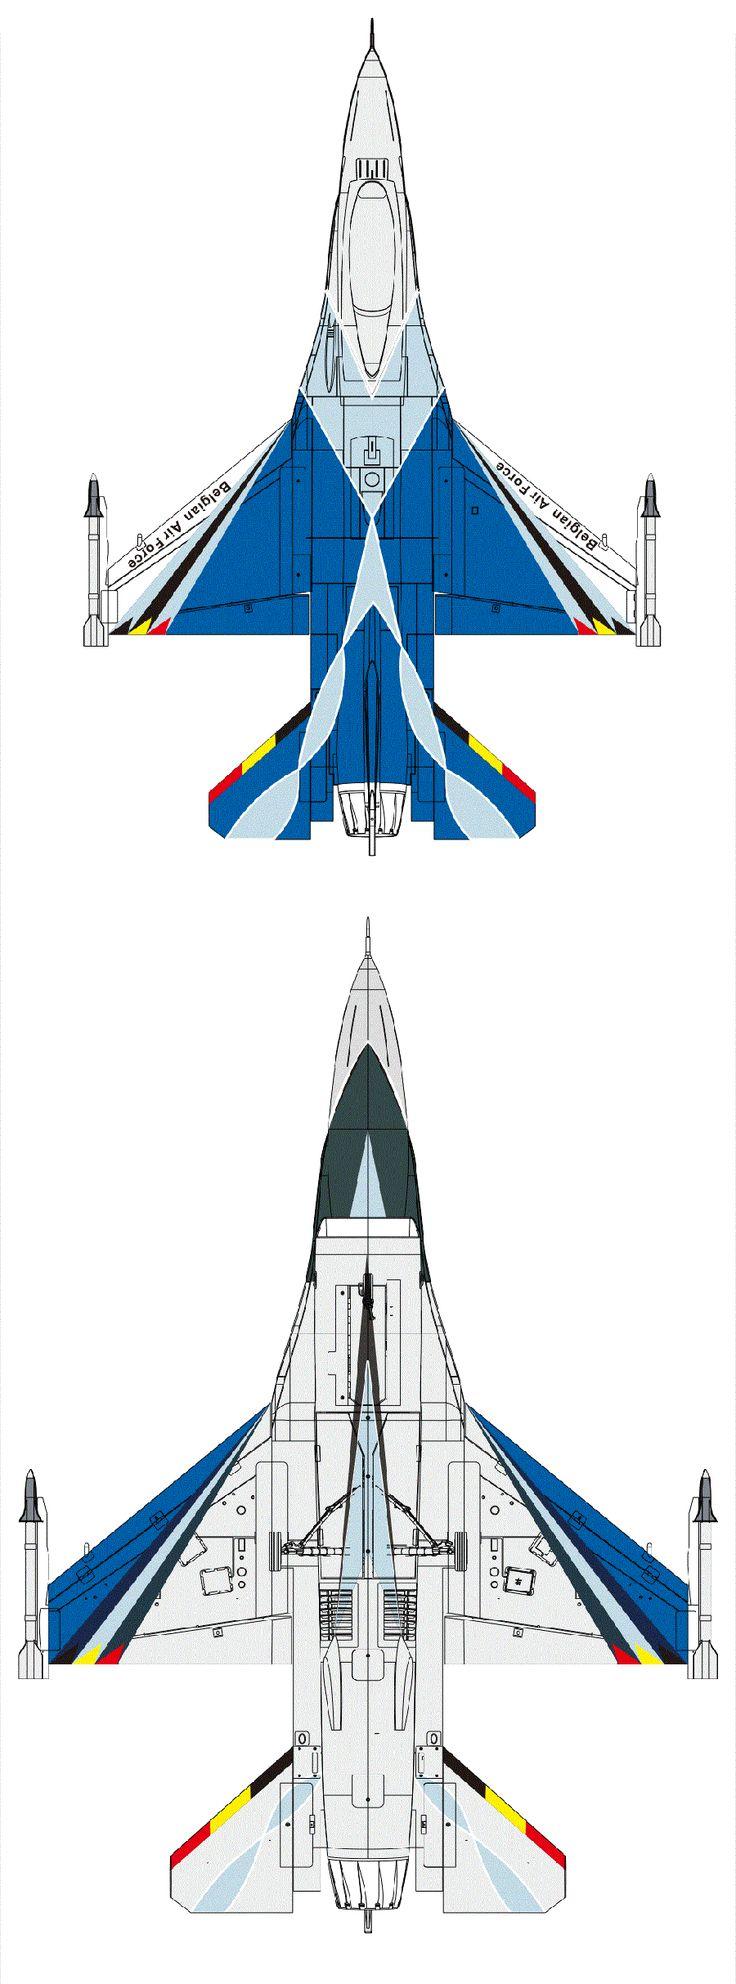 HSD F-16 F16 Grey Camo 105mm EDF PNP With Stabilizer Sale - Banggood.com